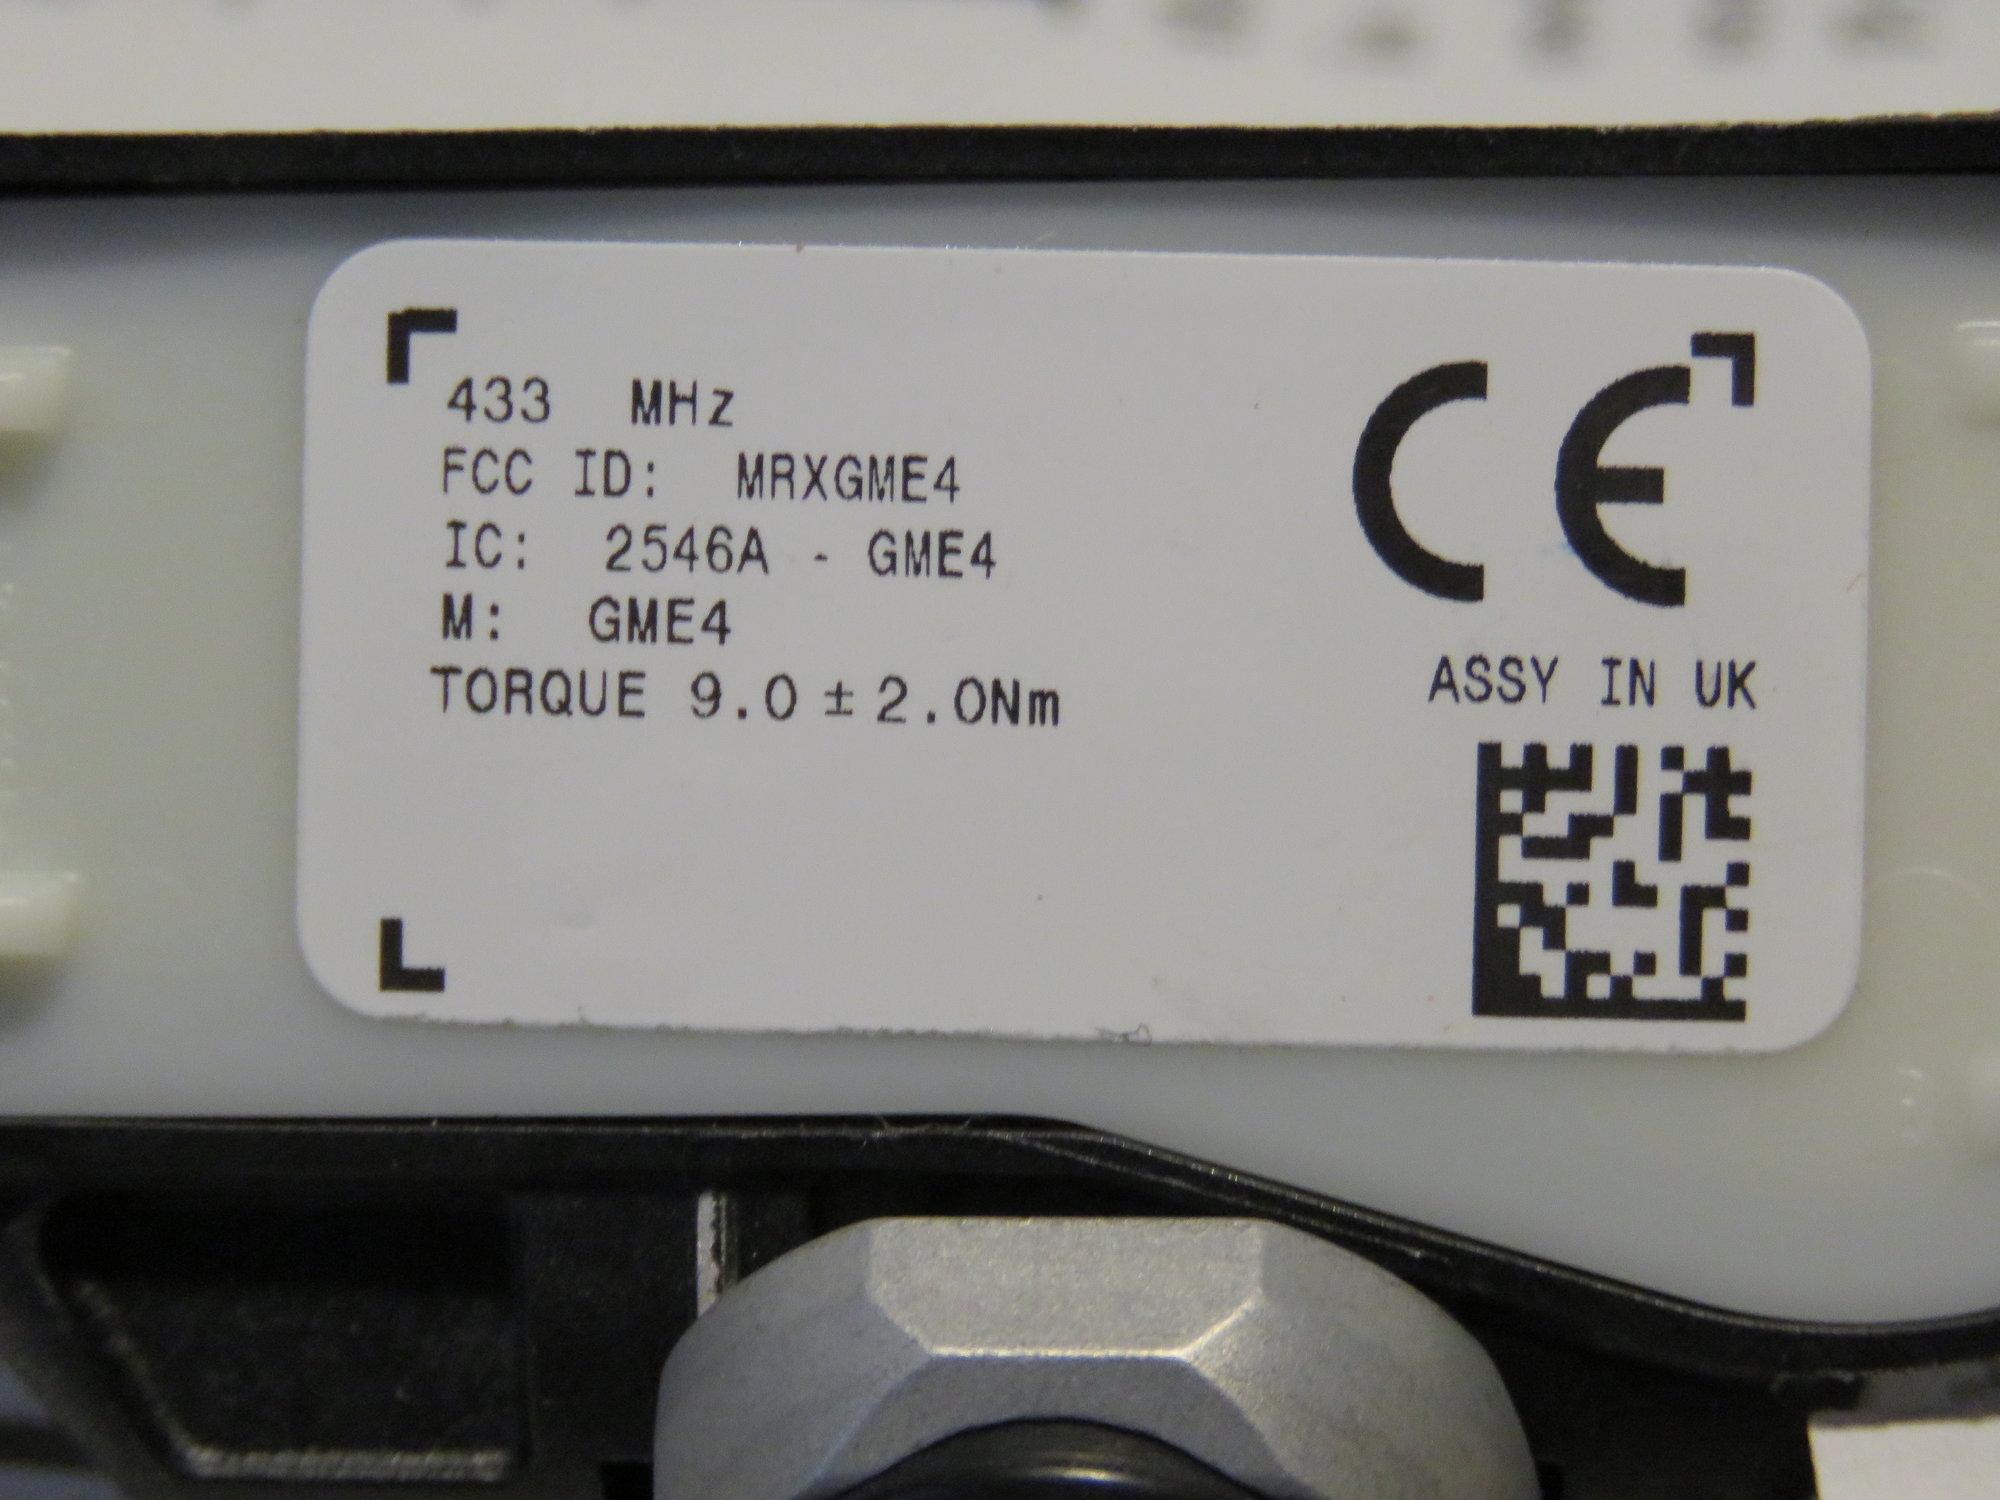 Capteur de pression des pneus  Img_2325_dff4a1f9cb9bd663a631d4f7ee6b148bd39796a6